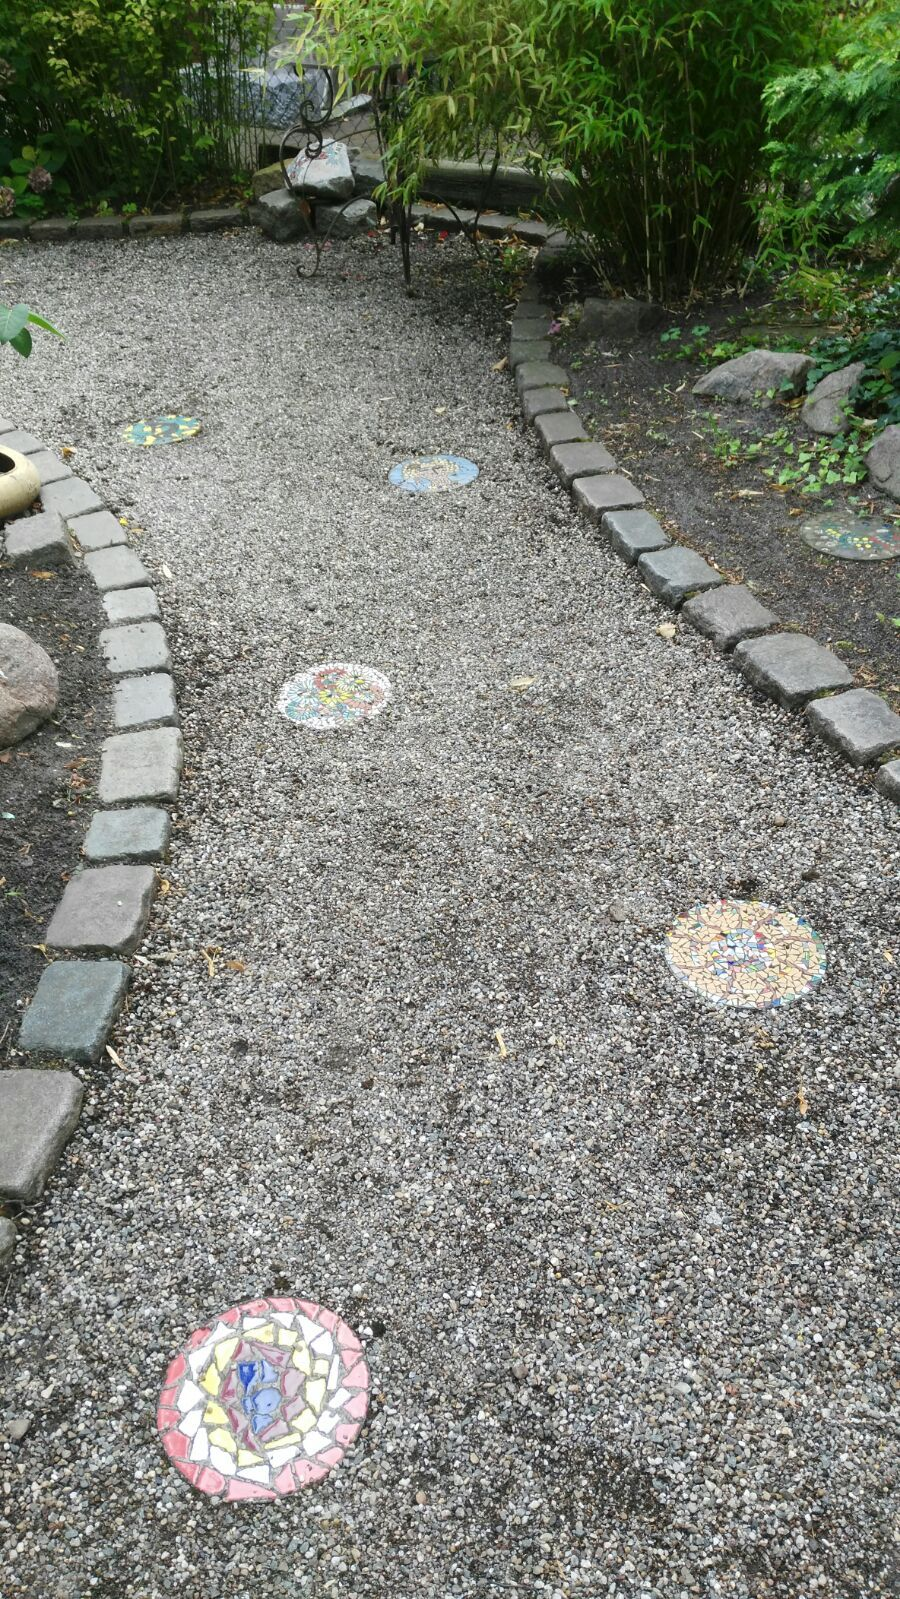 viele bunte mosaikflecken auf dem kiesweg | mosaik garten | pinterest